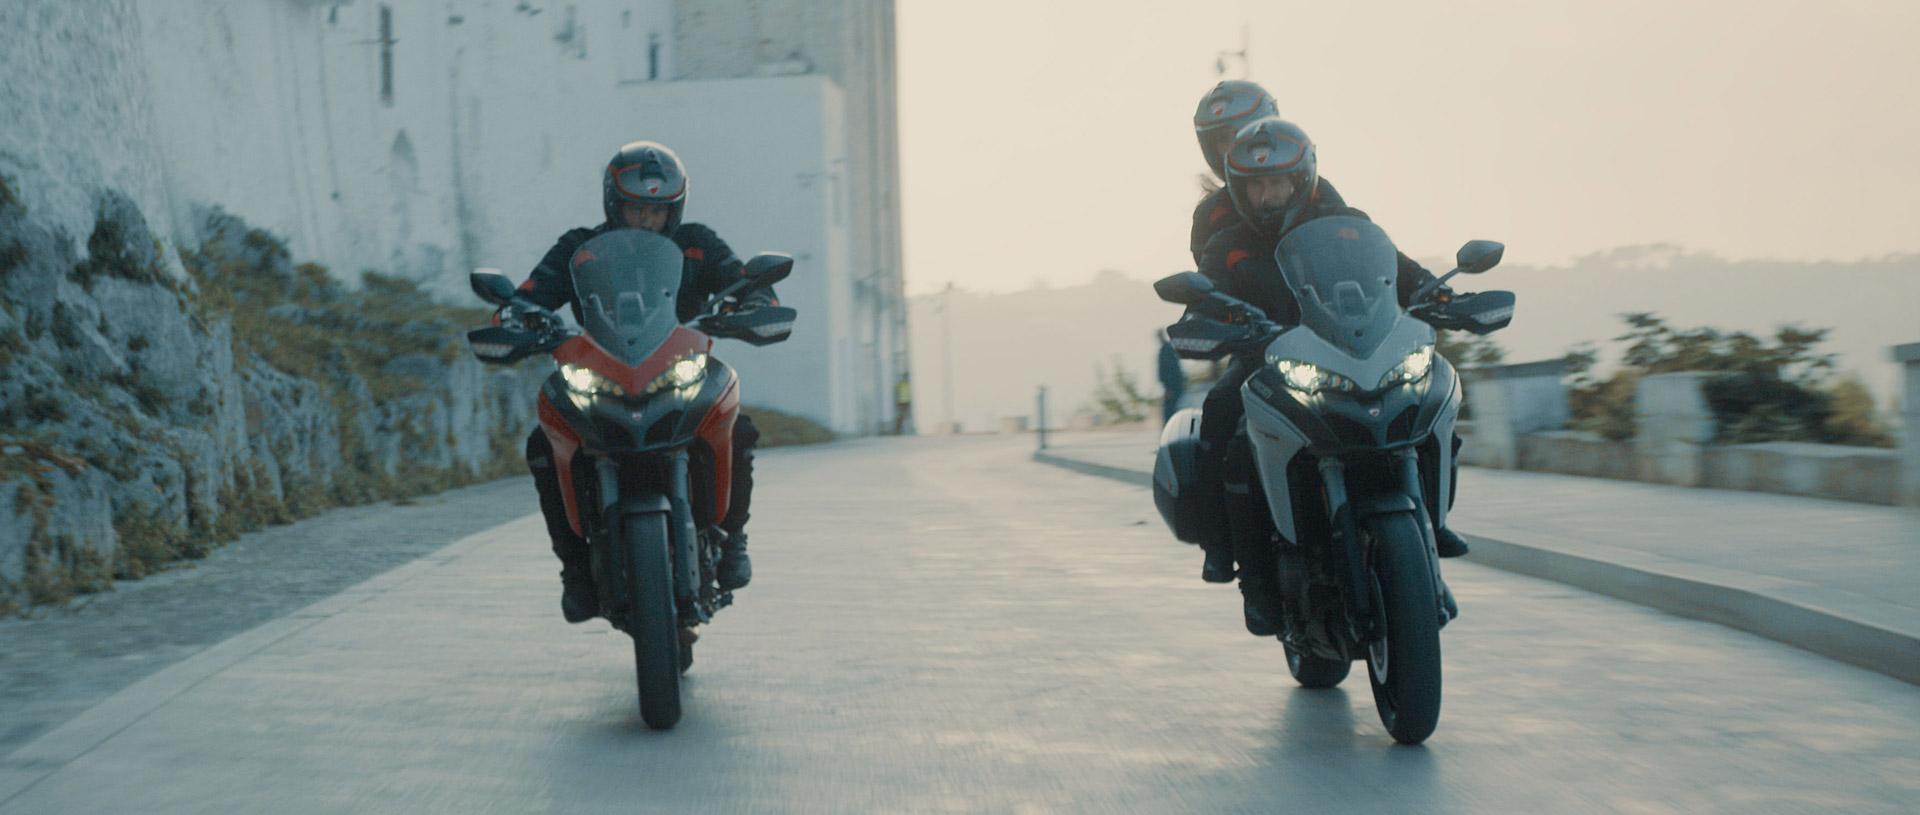 Ducati – Extraordinary Journey